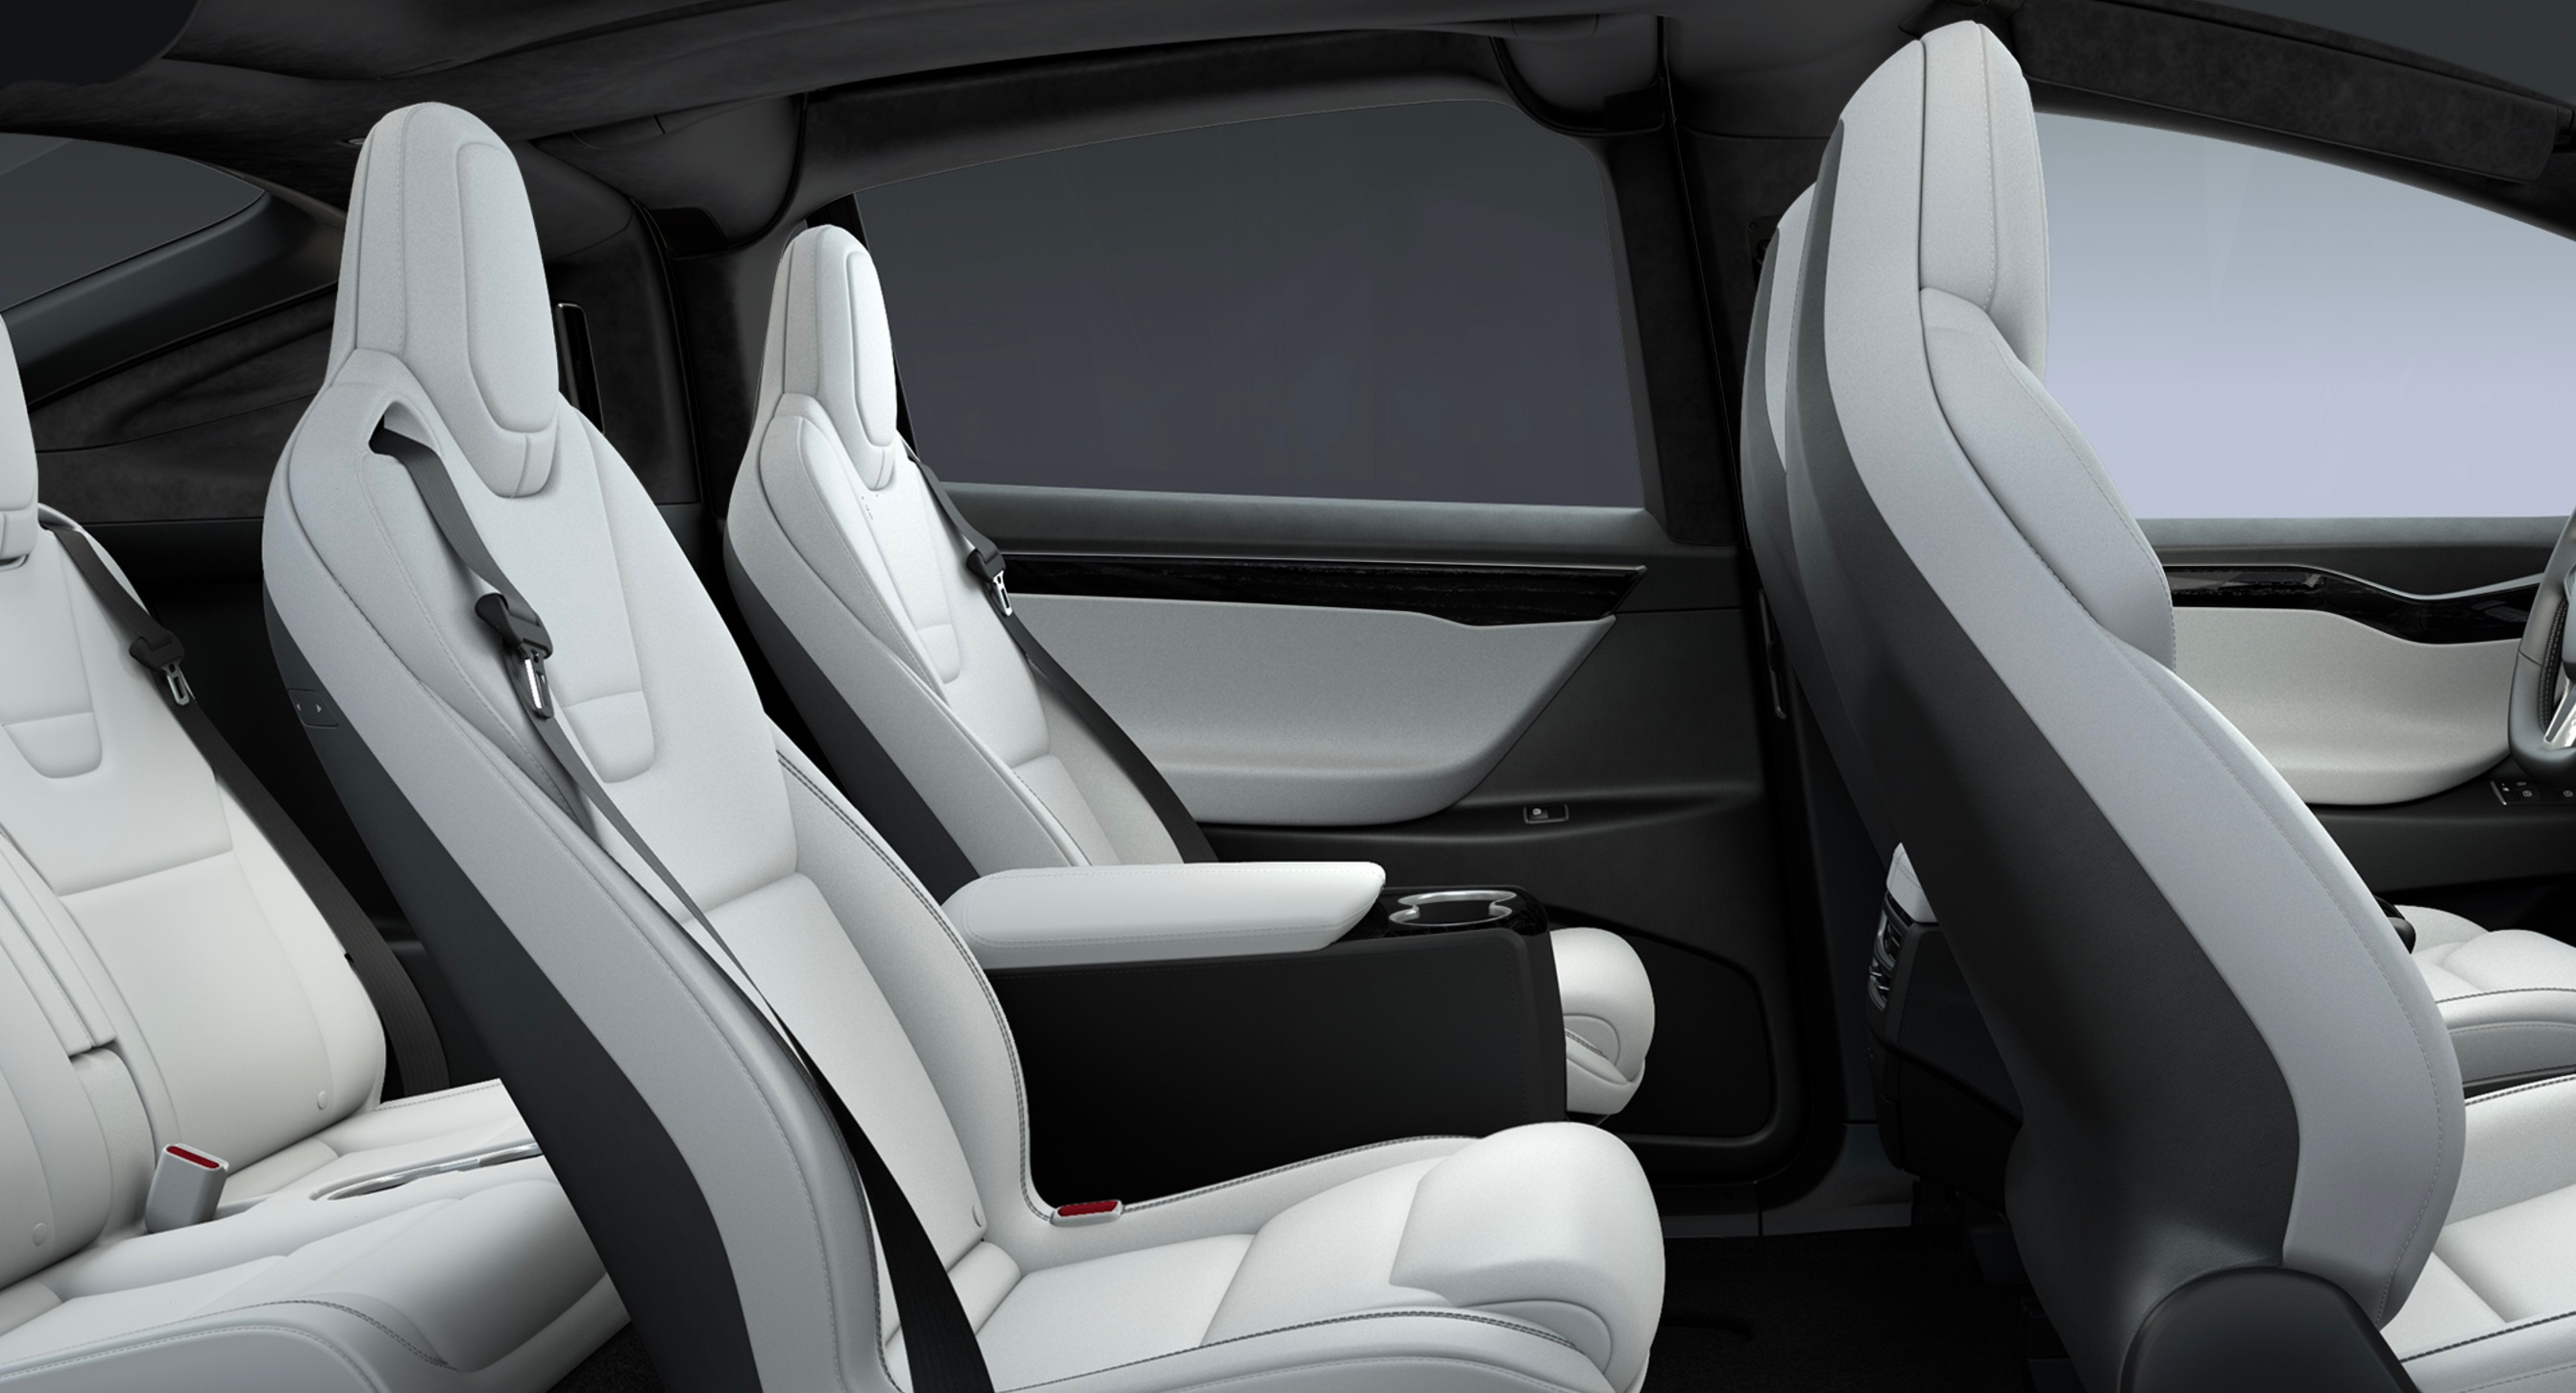 tesla-model-x-rear-center-console-6-seat